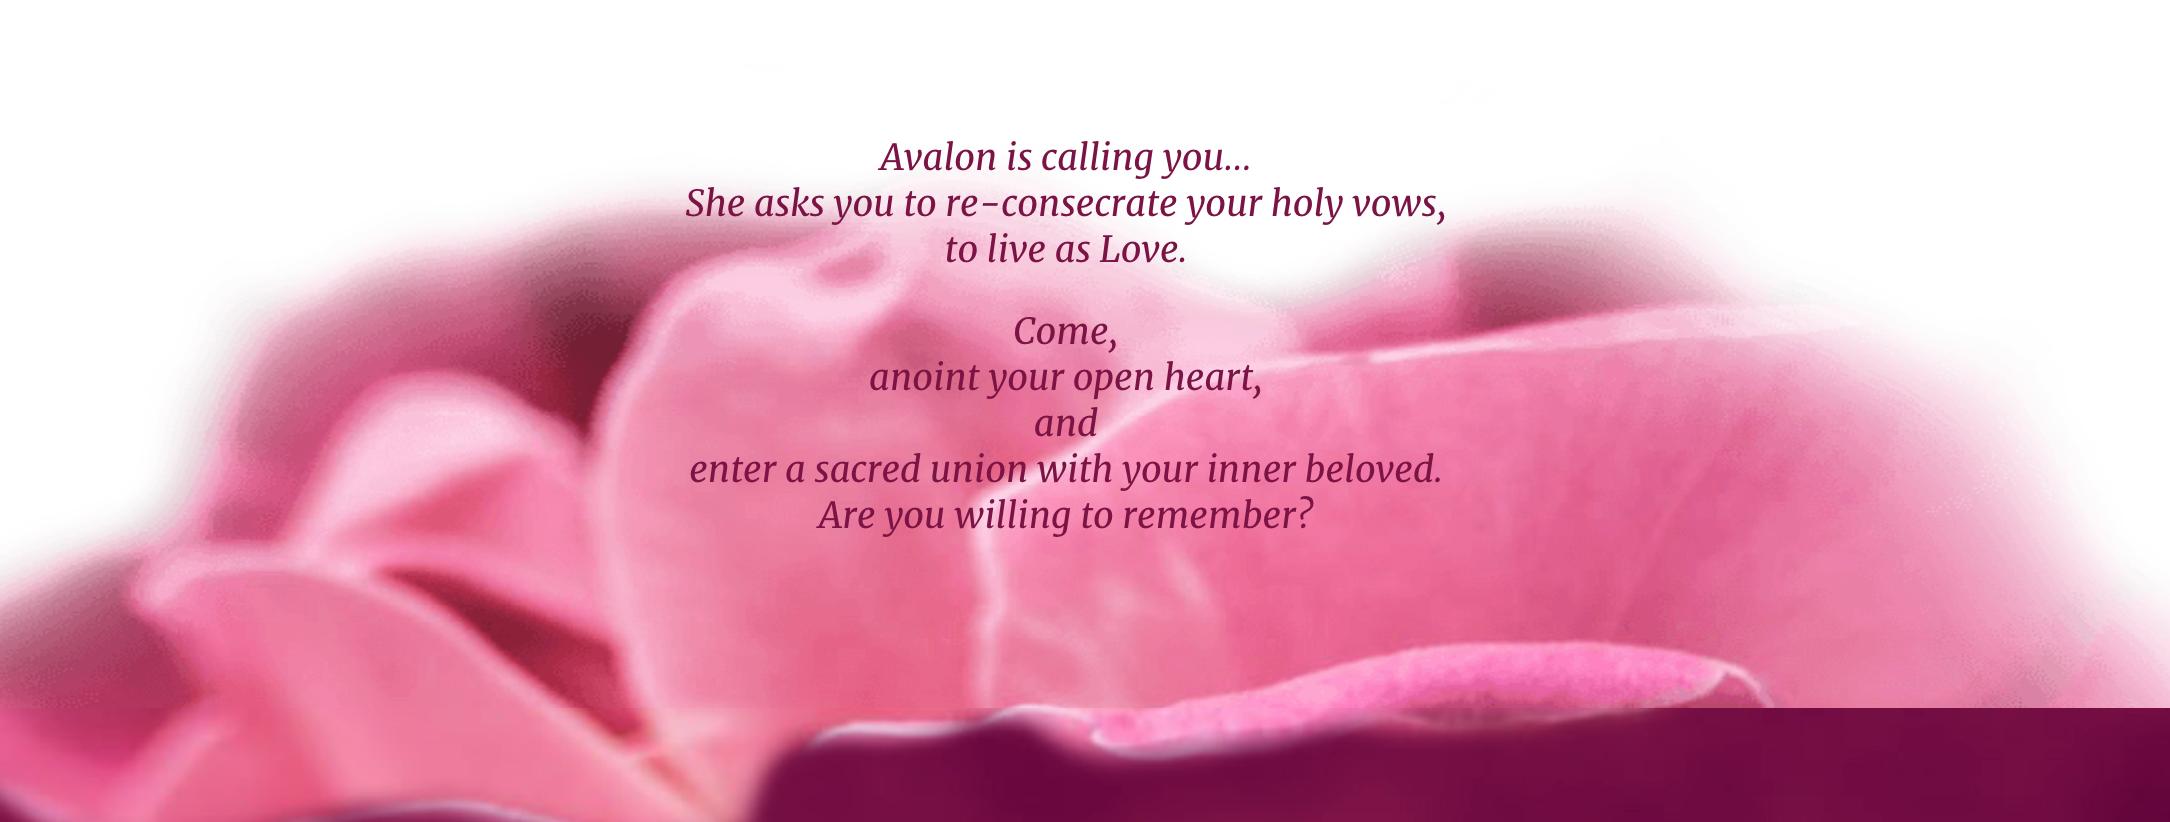 Avalon_Retreat___Join_Us_-_Priestess_Presence.png